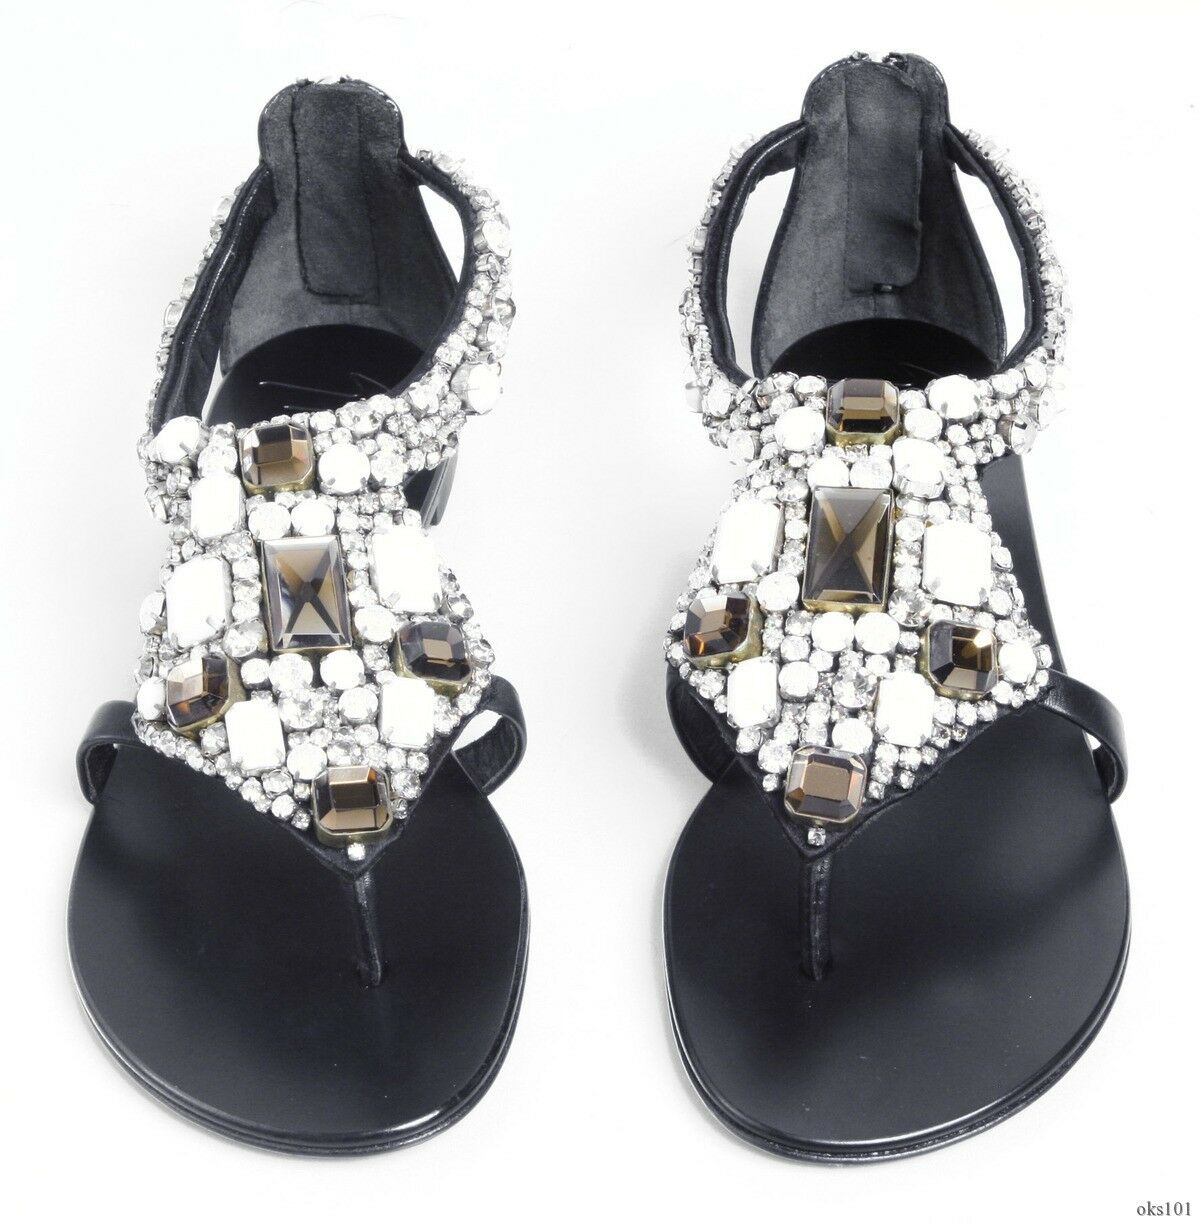 new shoes $1500 Giuseppe ZANOTTI all JEWELED rhinestones flats shoes new 36 US 6 - AMAZING d2d9e5